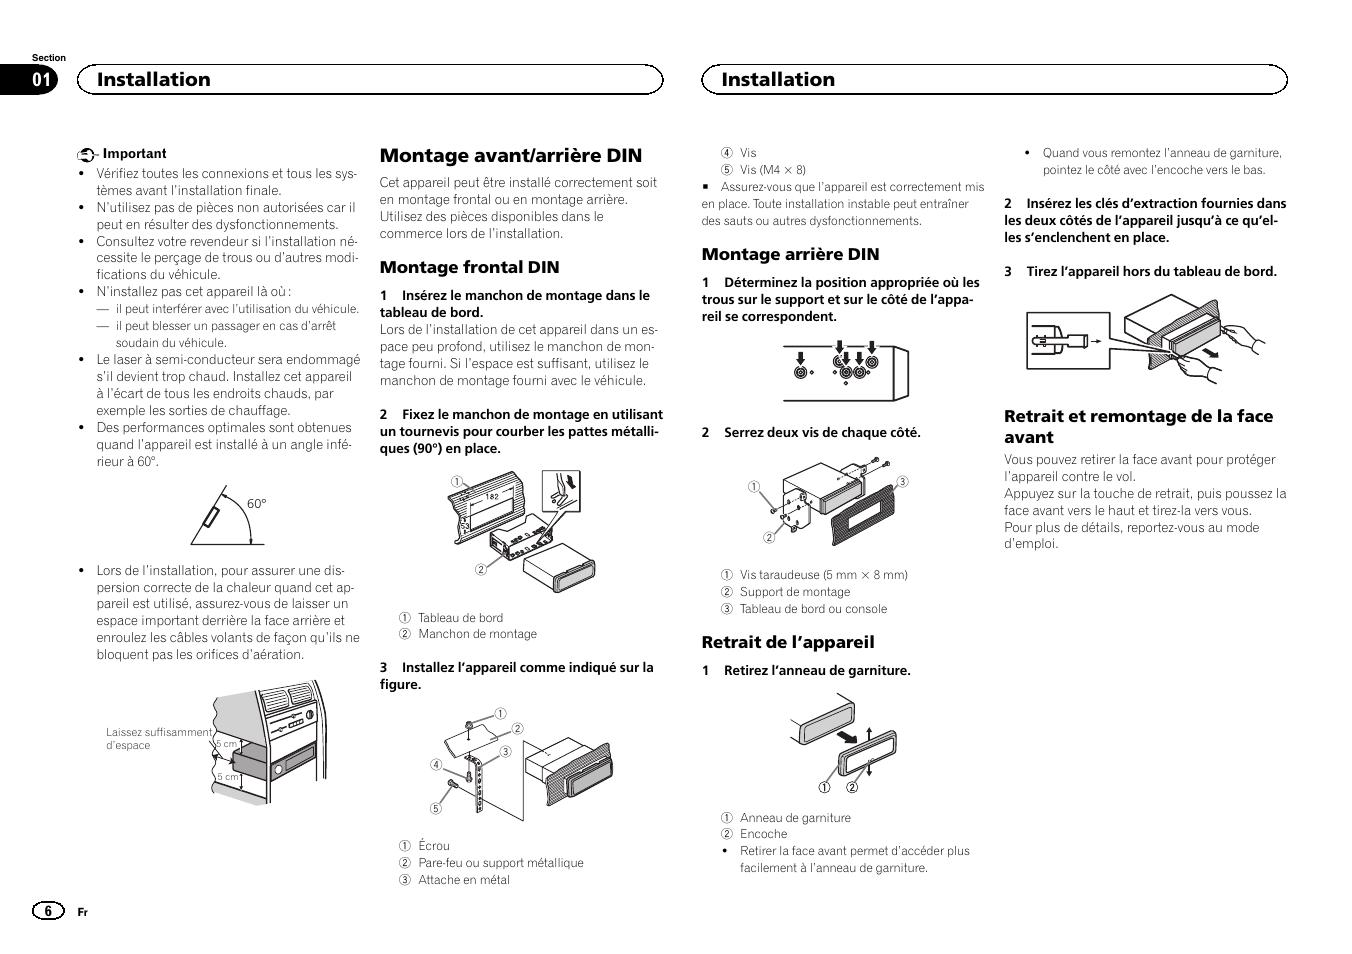 fran ais montage avant arri re din installation pioneer deh rh manualsdir com Pioneer Deh 64Bt Owner's Manual Pioneer Deh 64Bt Owner's Manual